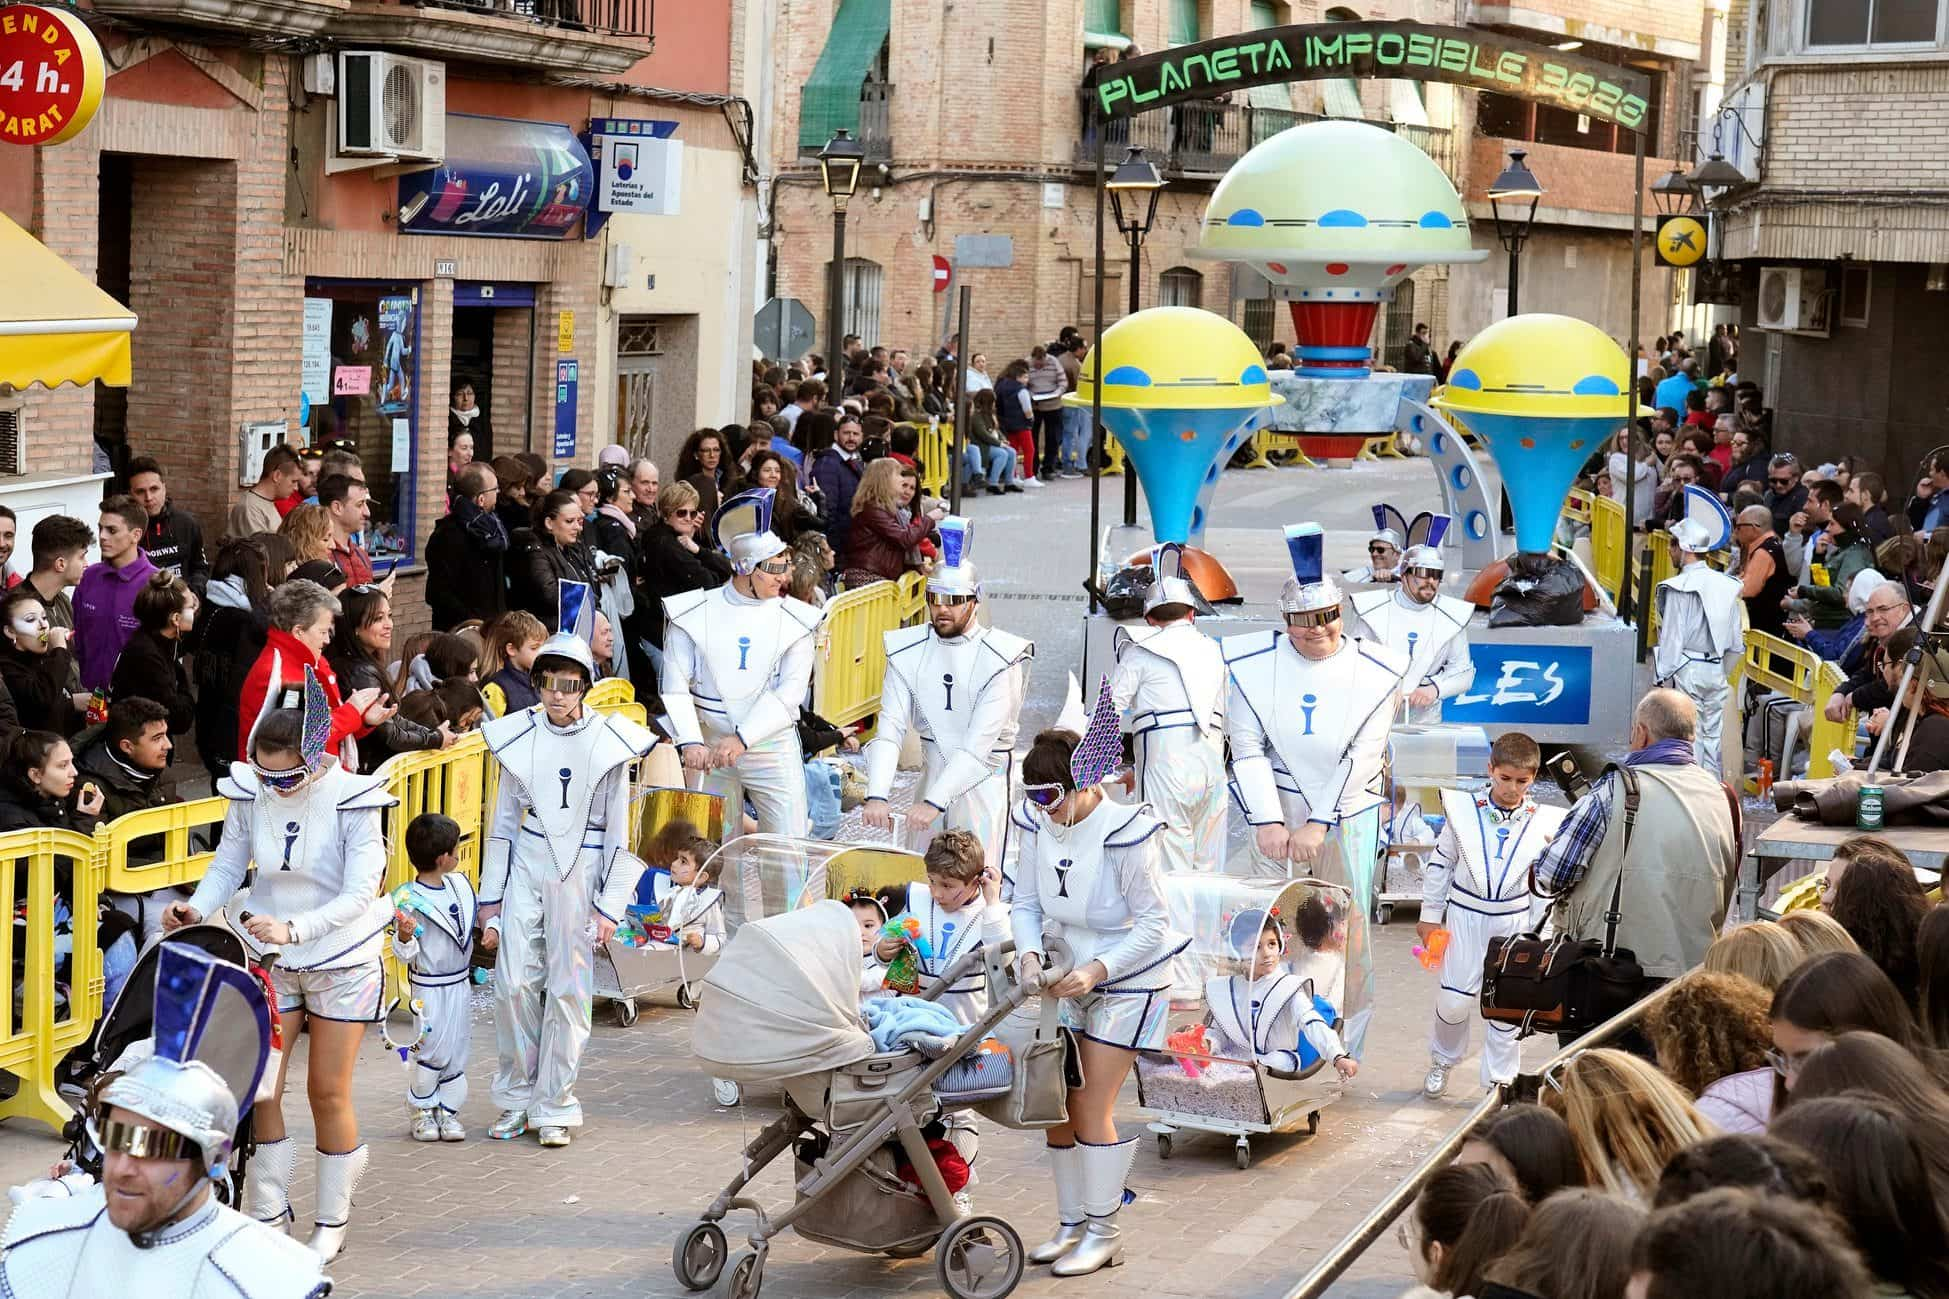 Carnaval de herencia 2020 ofertorio 2 - Selección de fotografías del Ofertorio del Carnaval de Herencia